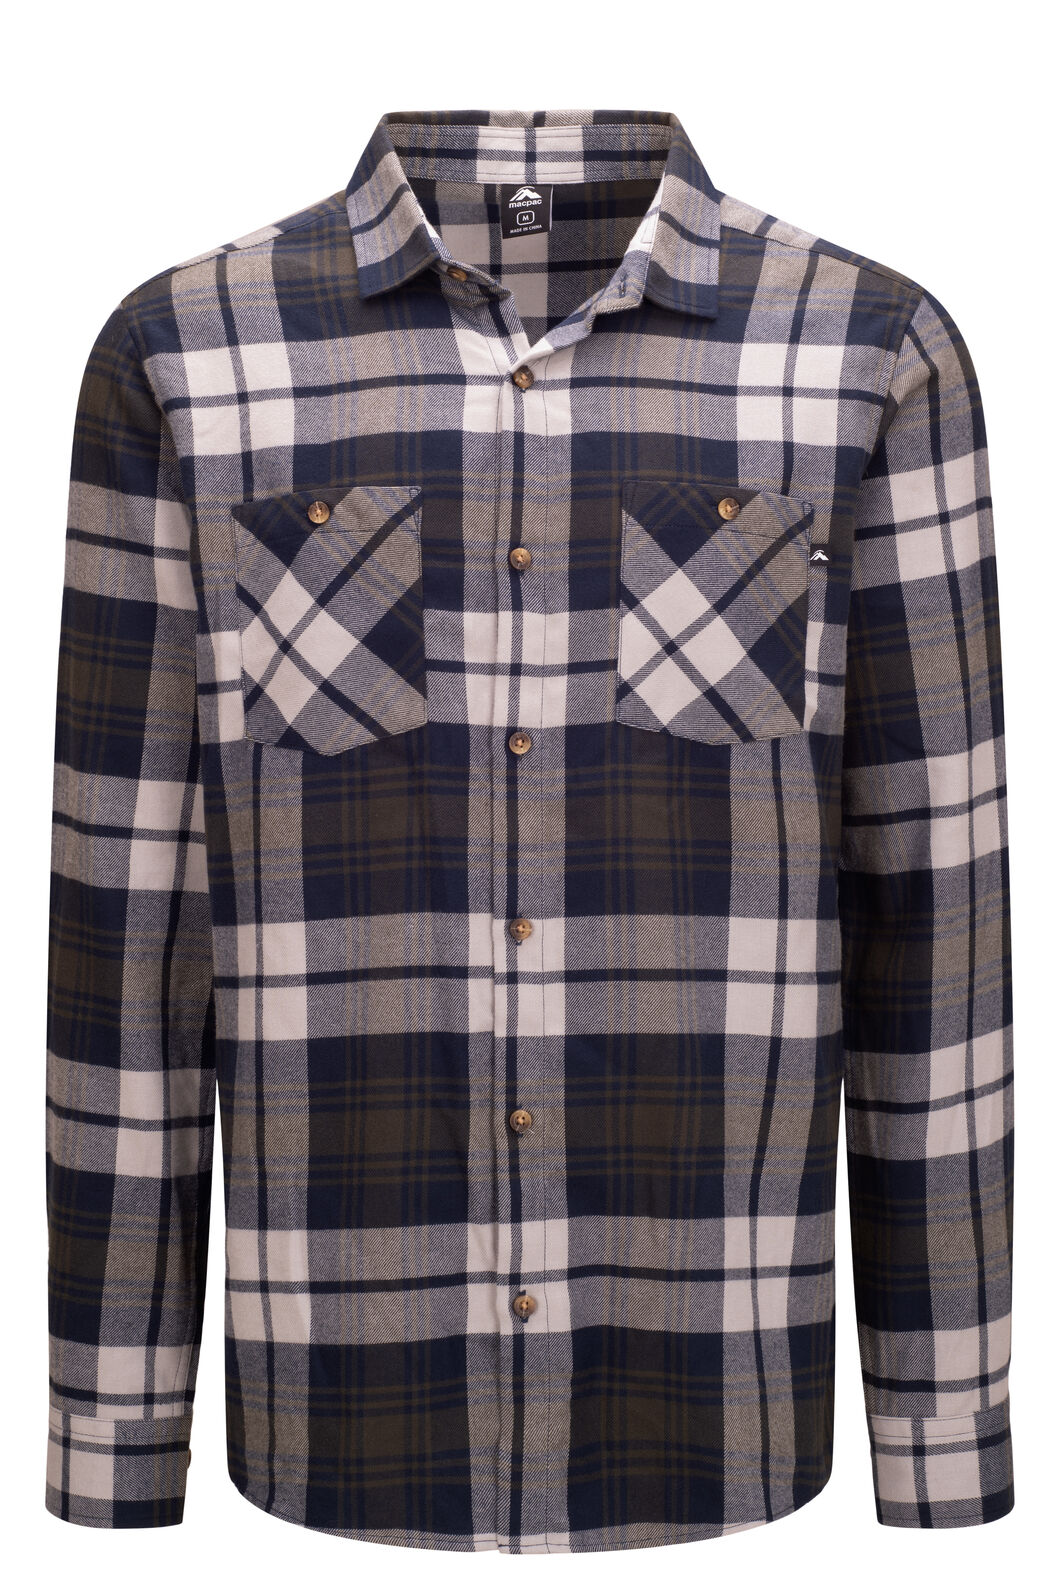 Macpac Porters Organic Cotton Flannel Shirt — Men's, Moonbeam/Peat, hi-res